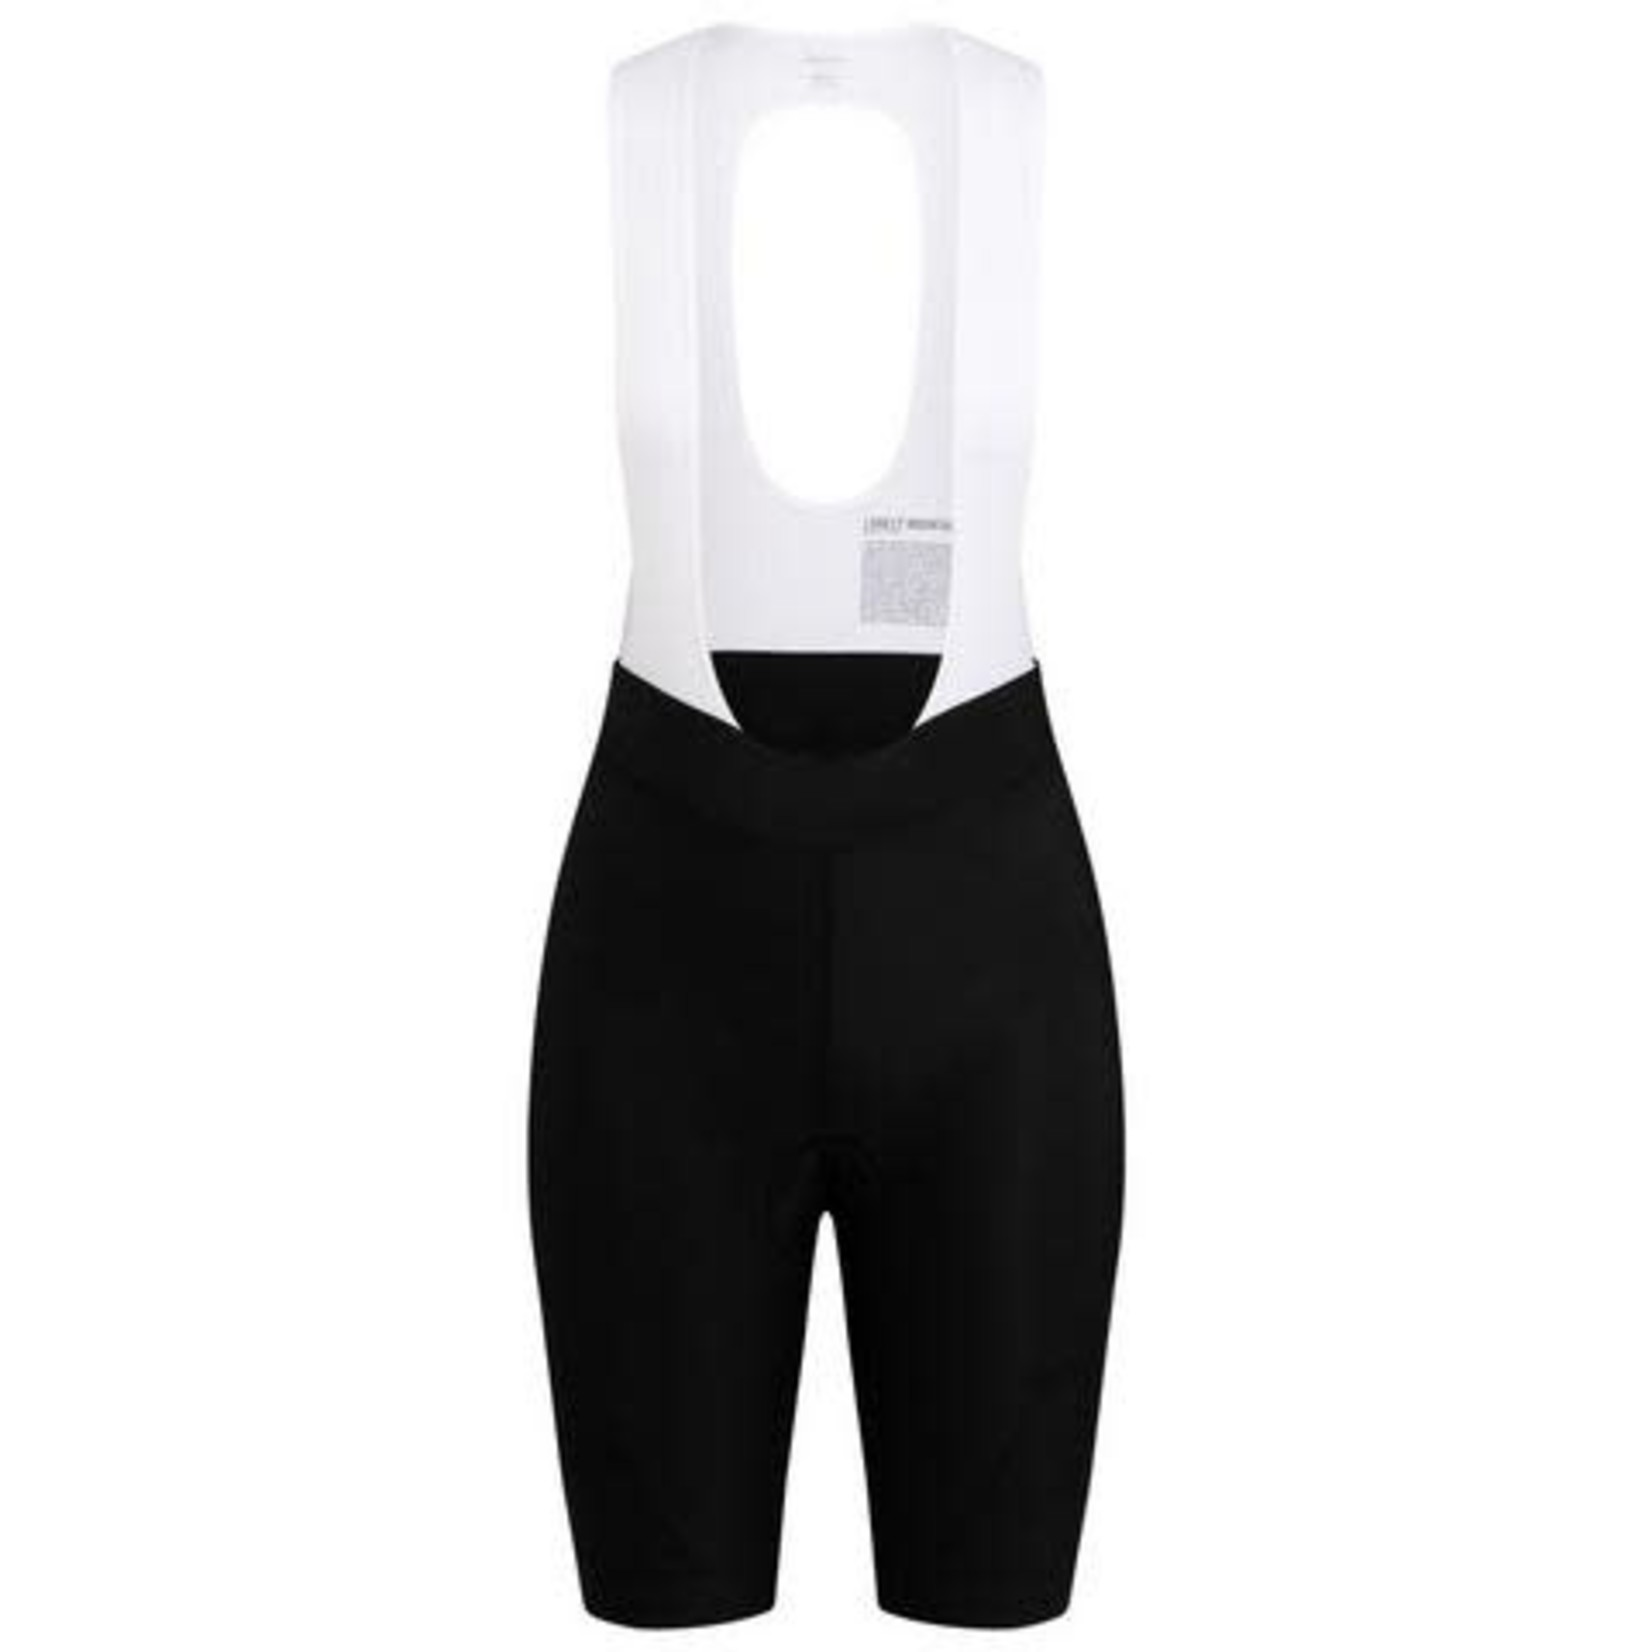 Rapha Rapha Women's Core Bib Shorts